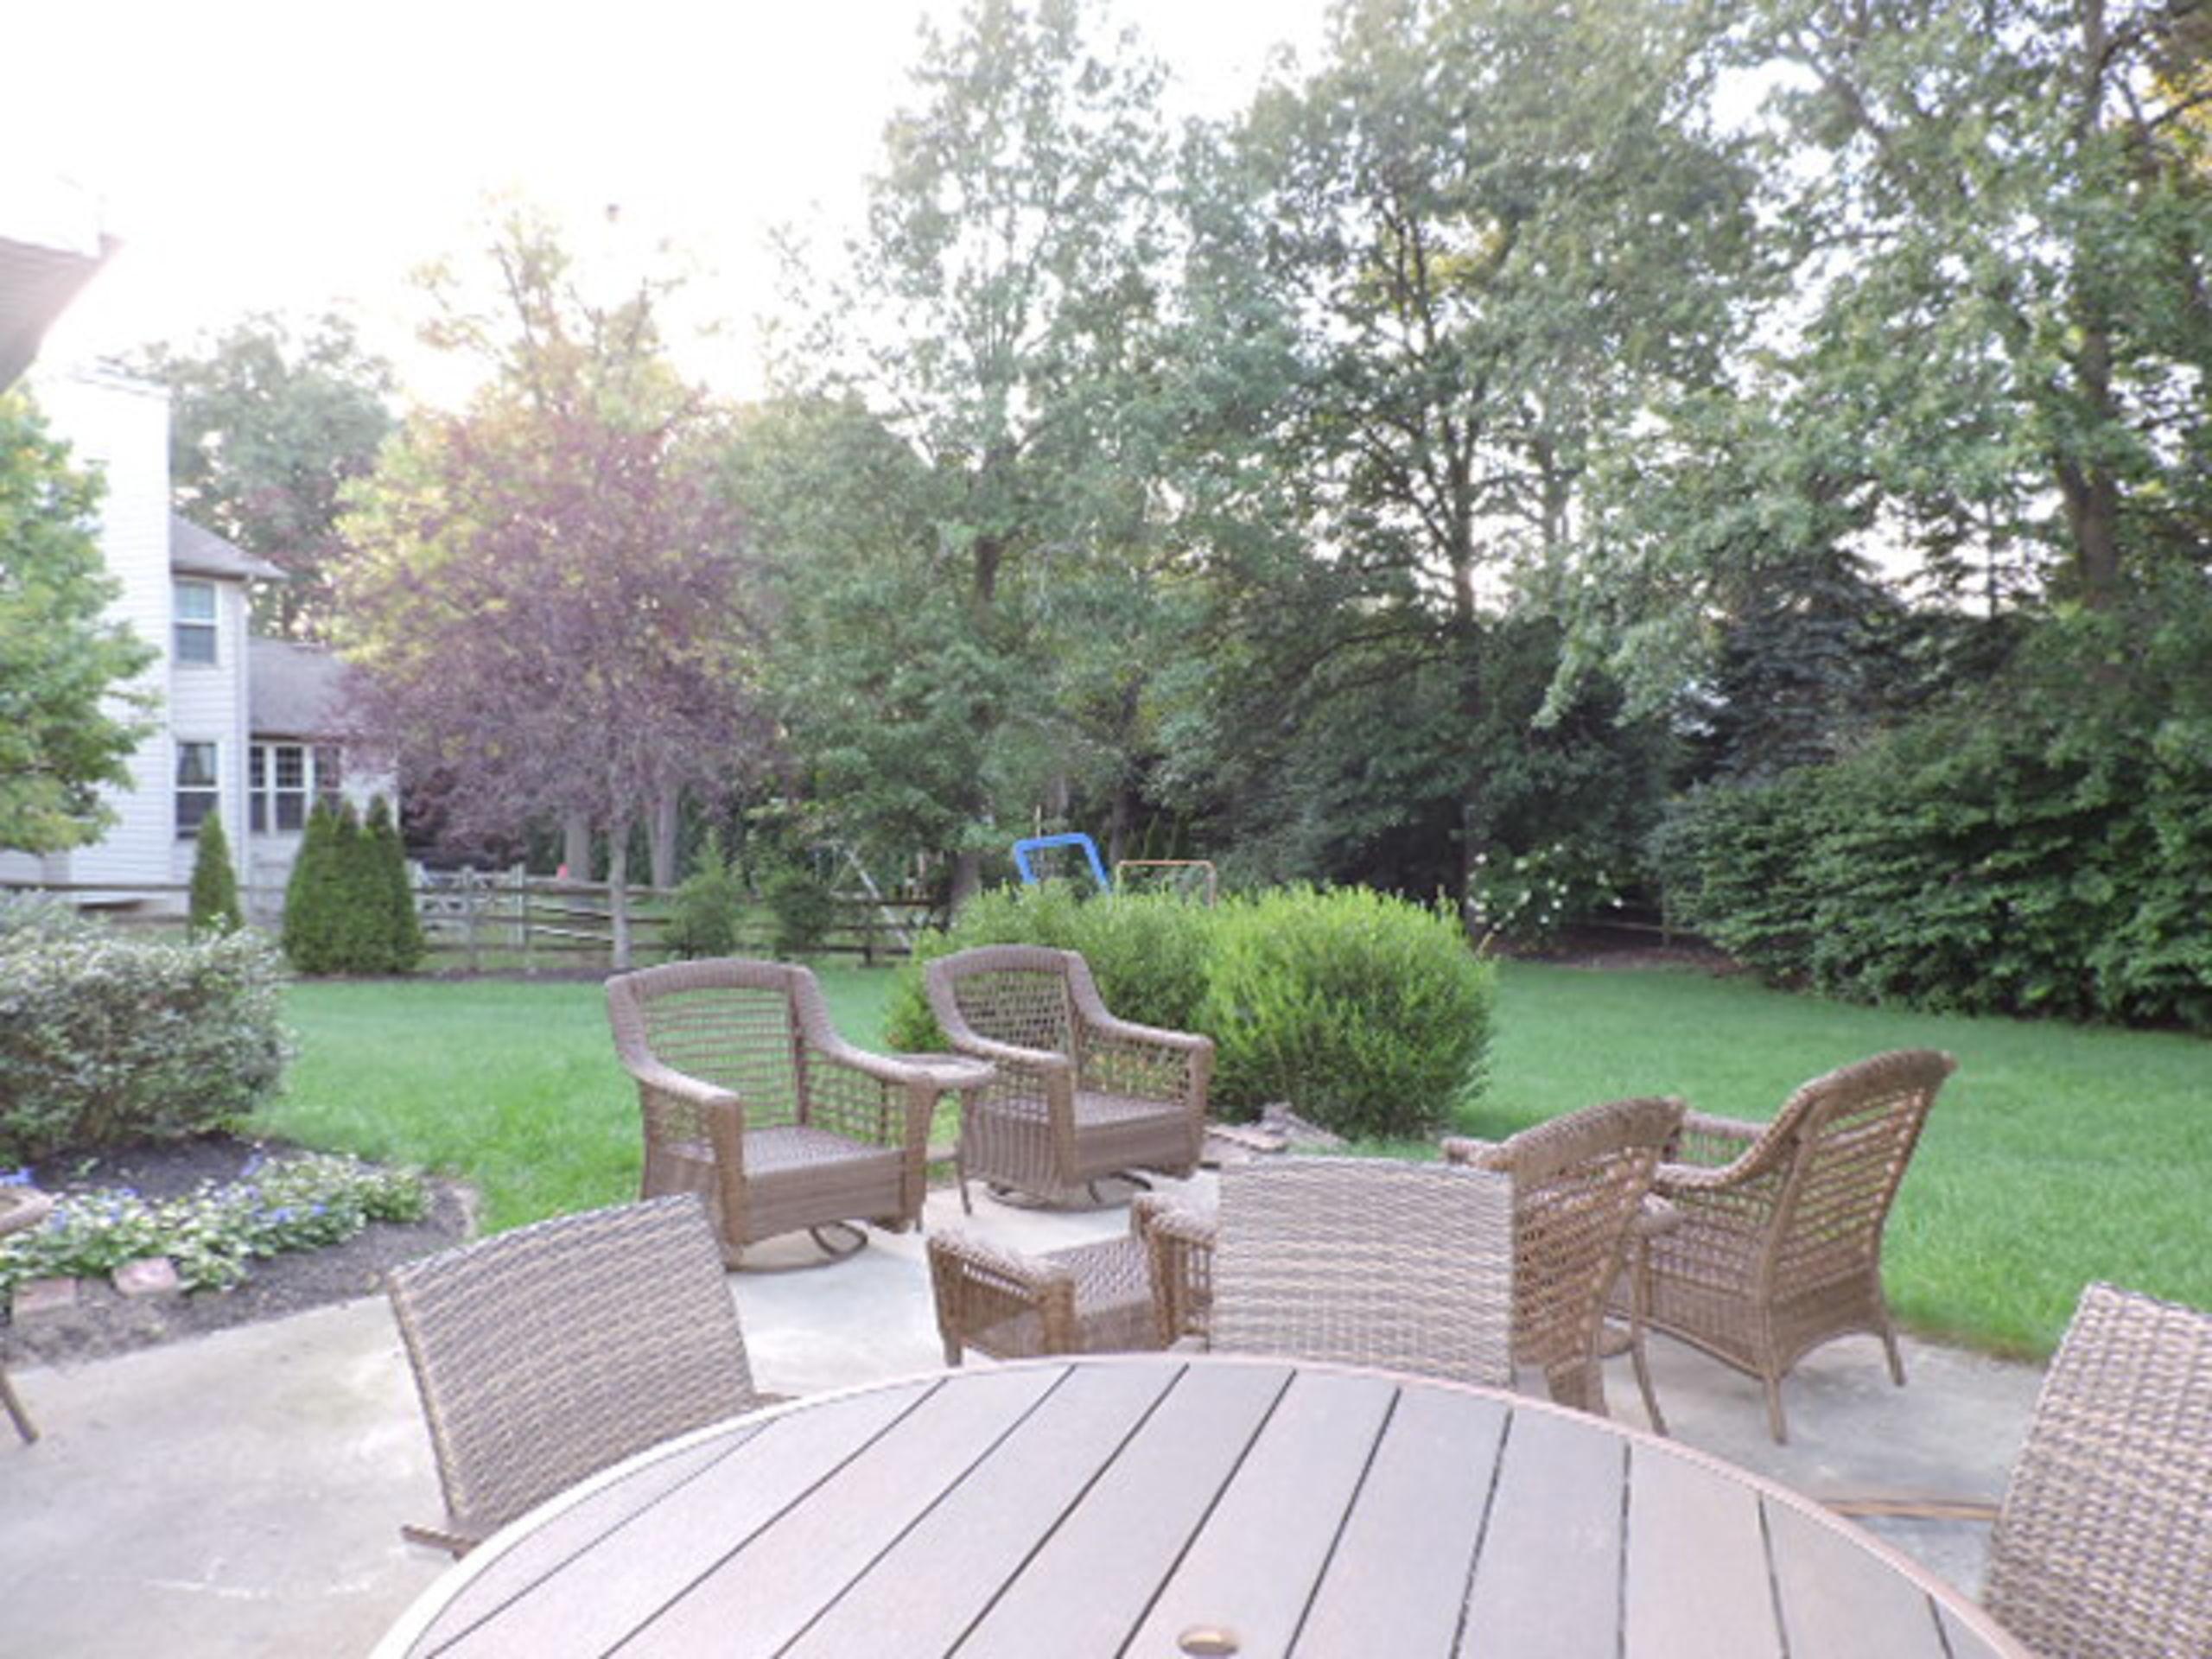 Nice rear yard with patio